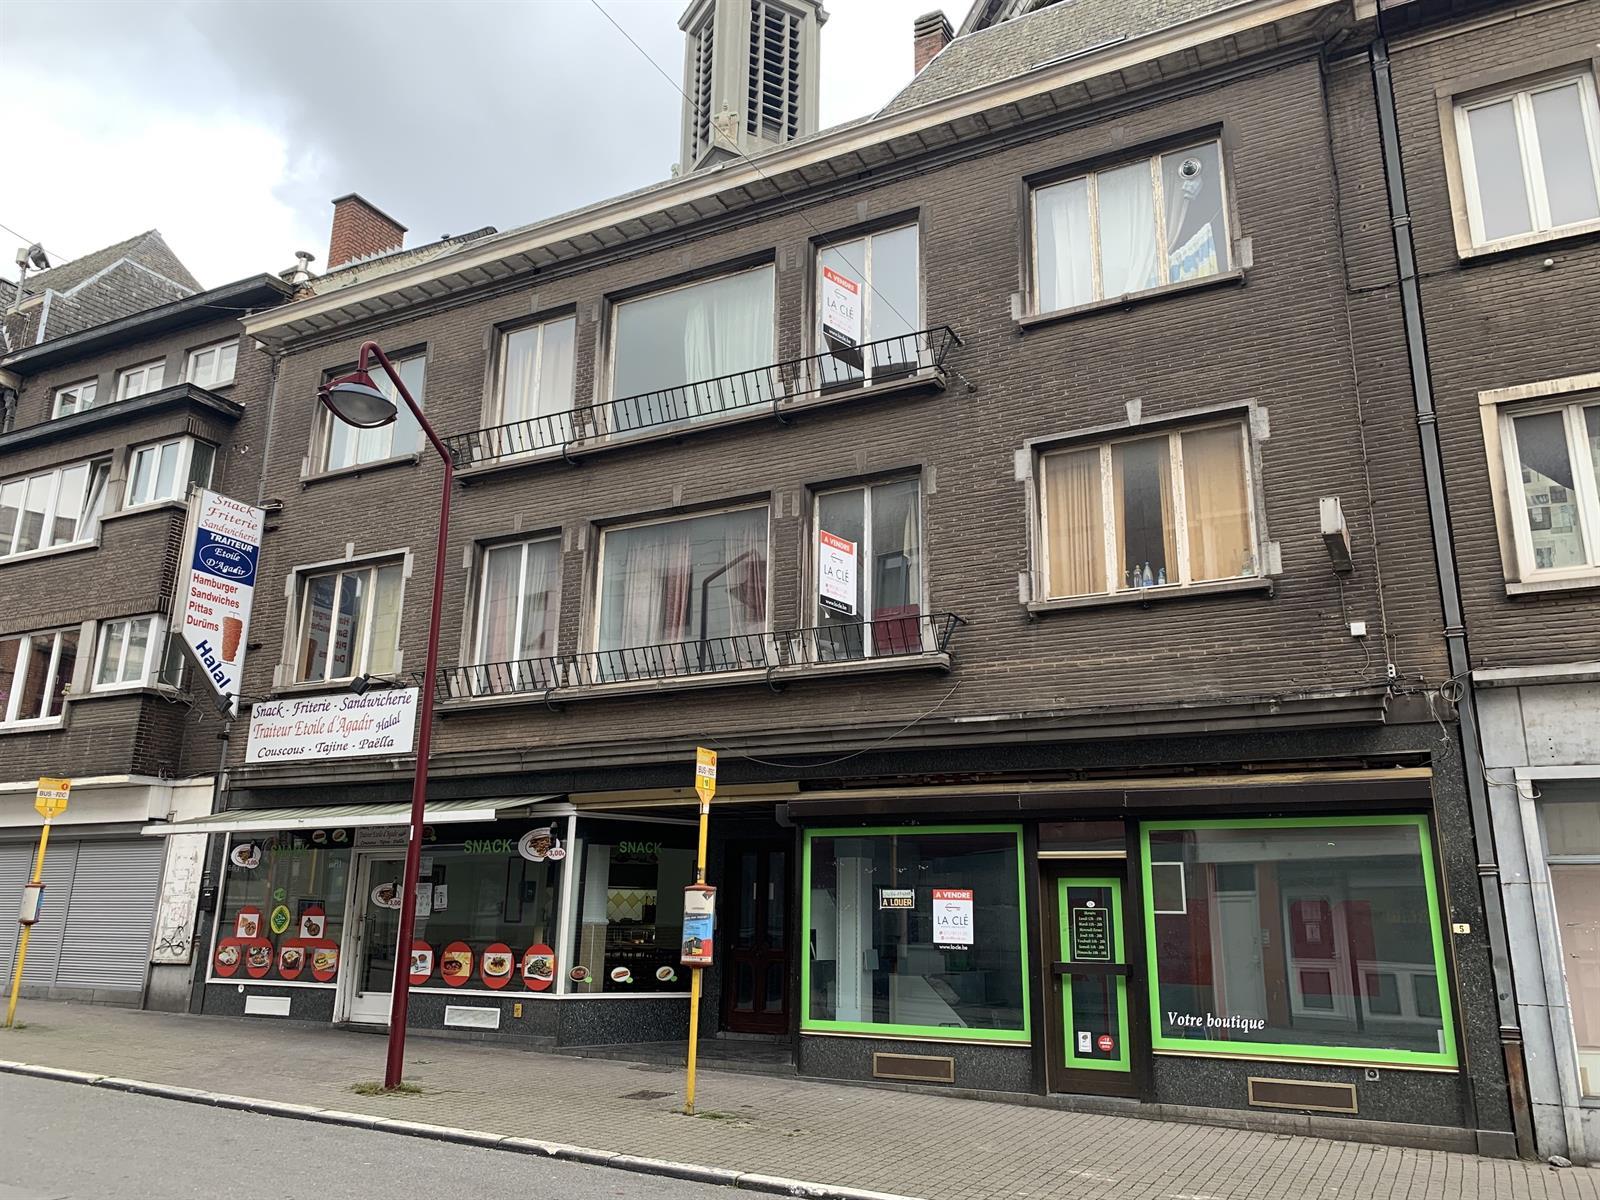 Immeuble à usage multiple - Charleroi - #4292206-1